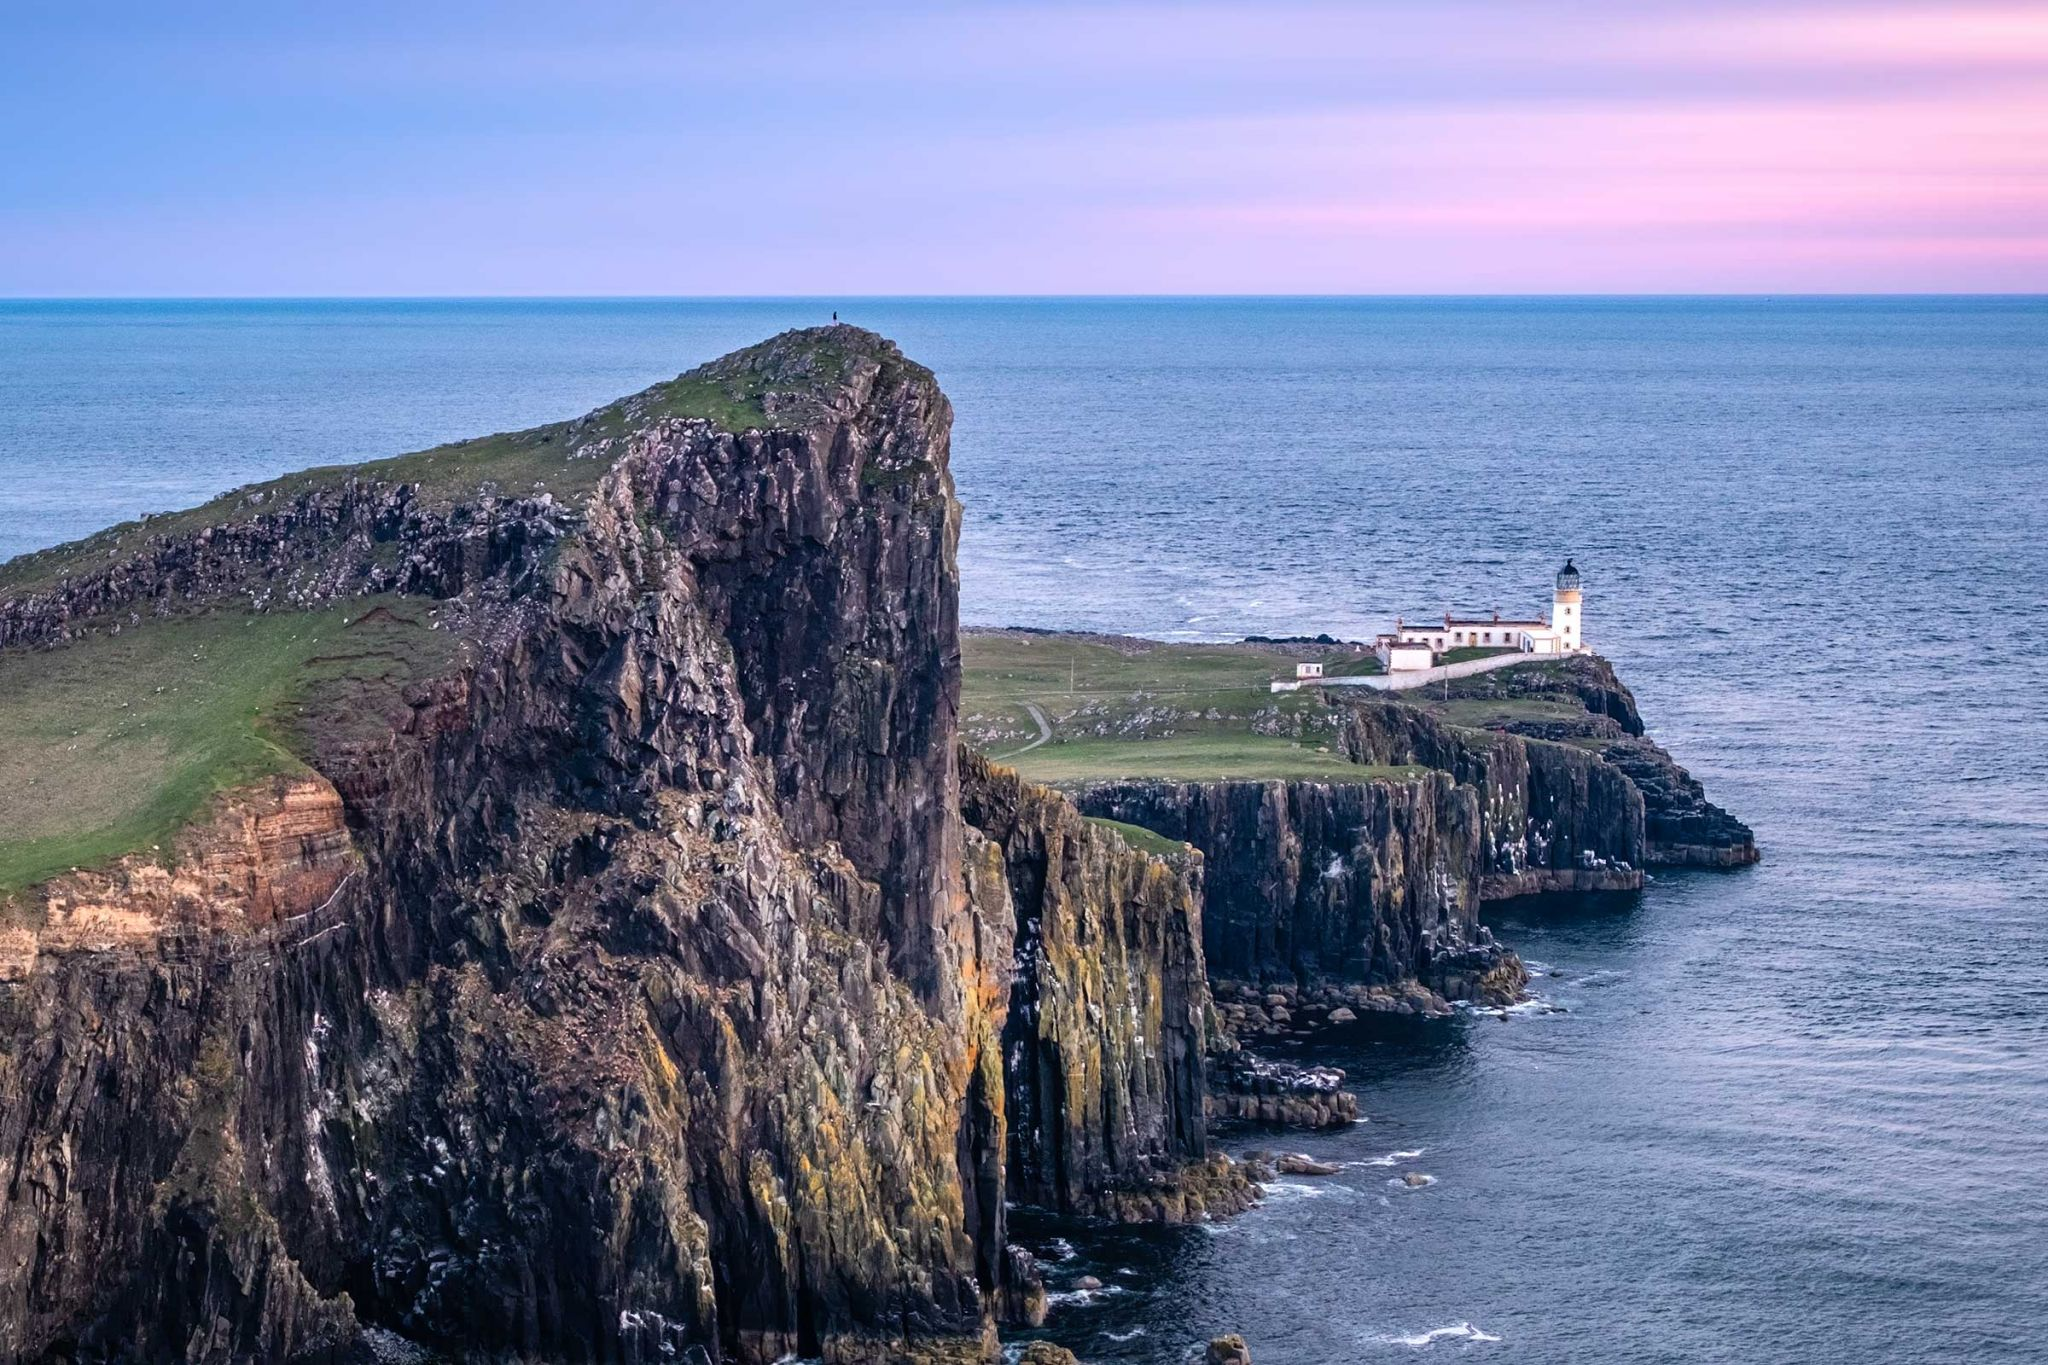 Neist Point Lighthouse, Skye, United Kingdom